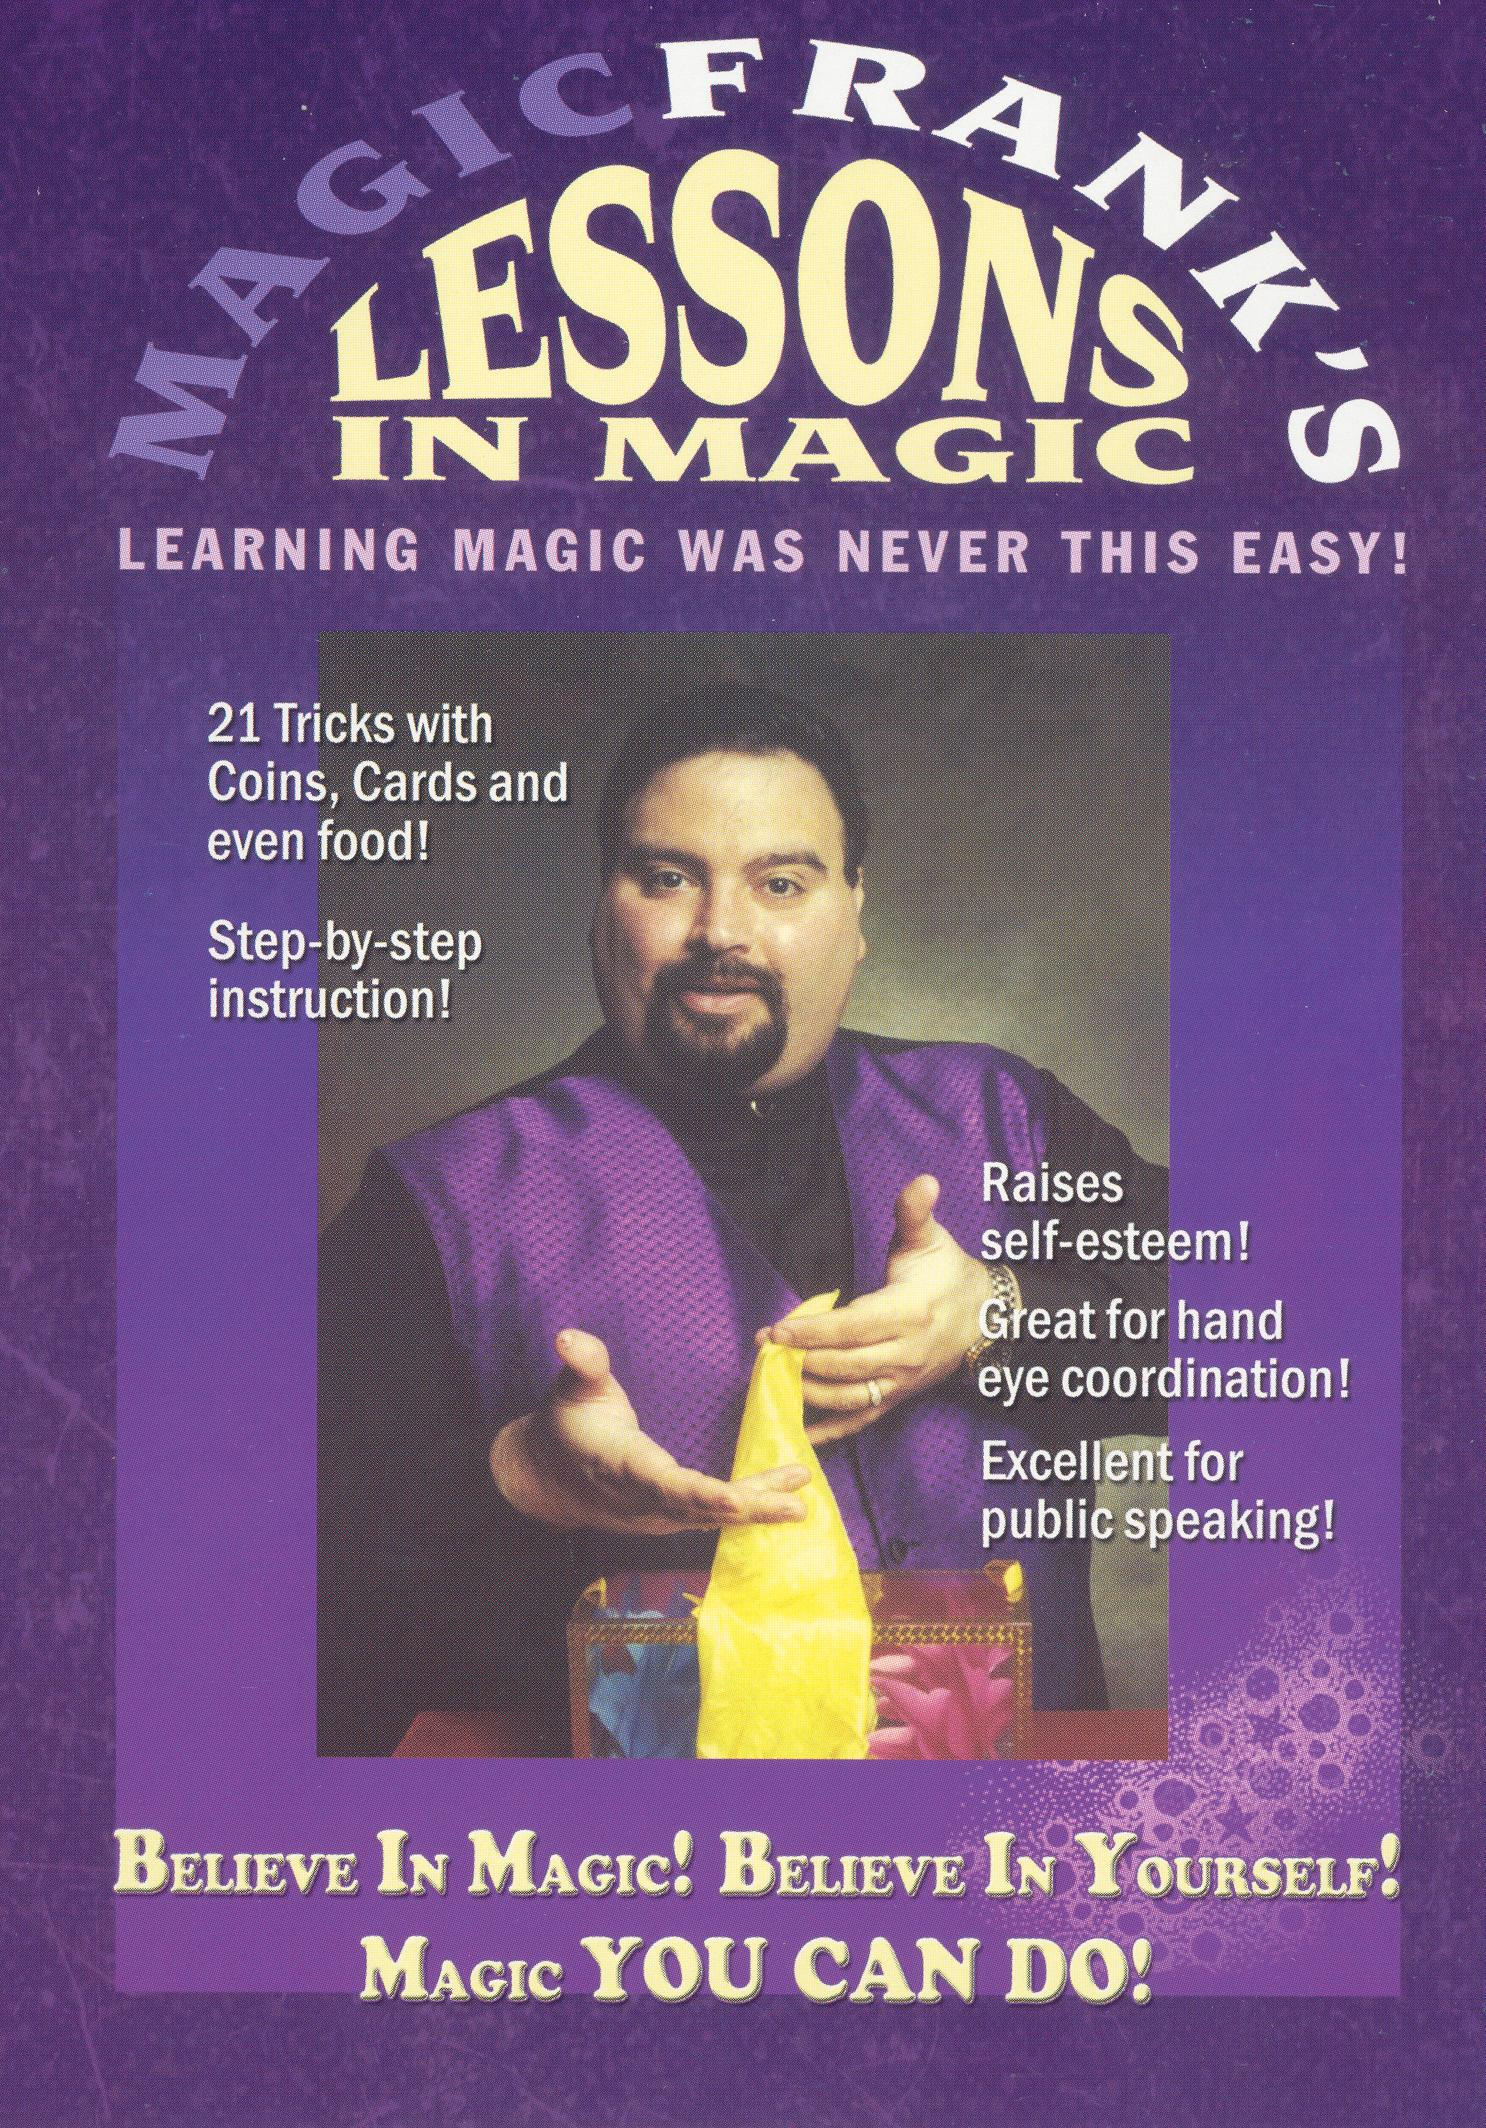 MAGICFRANK's Lessons in Magic: Believe in Magic!